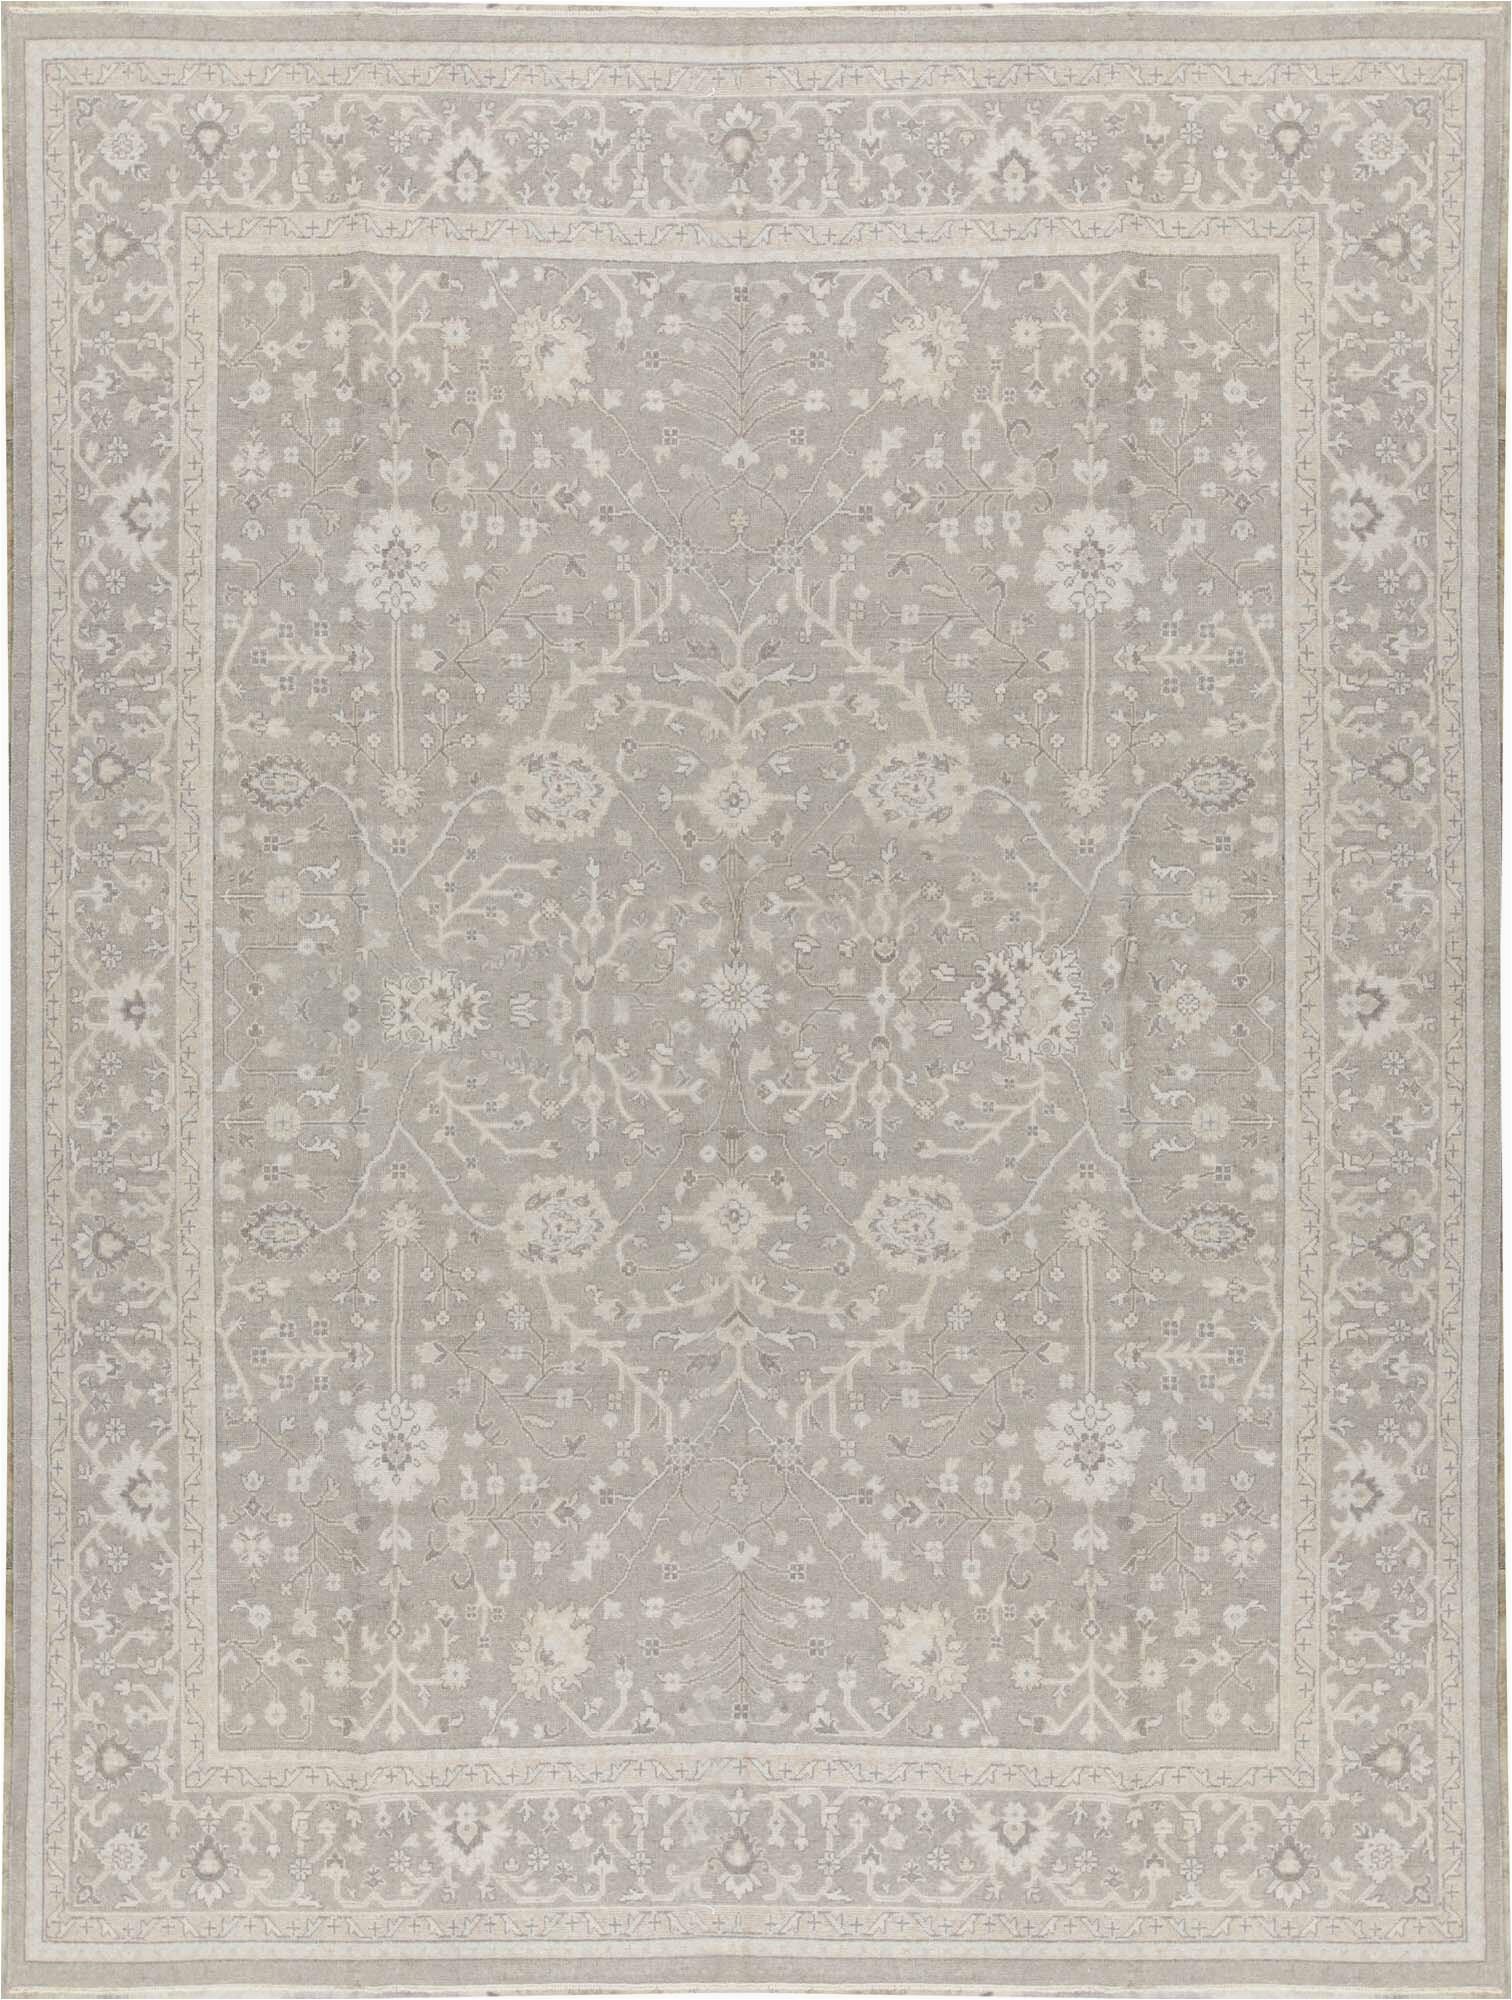 bokara rug co inc one of a kind hand knotted 11 11 x 15 1 grey grey area rug abib8766